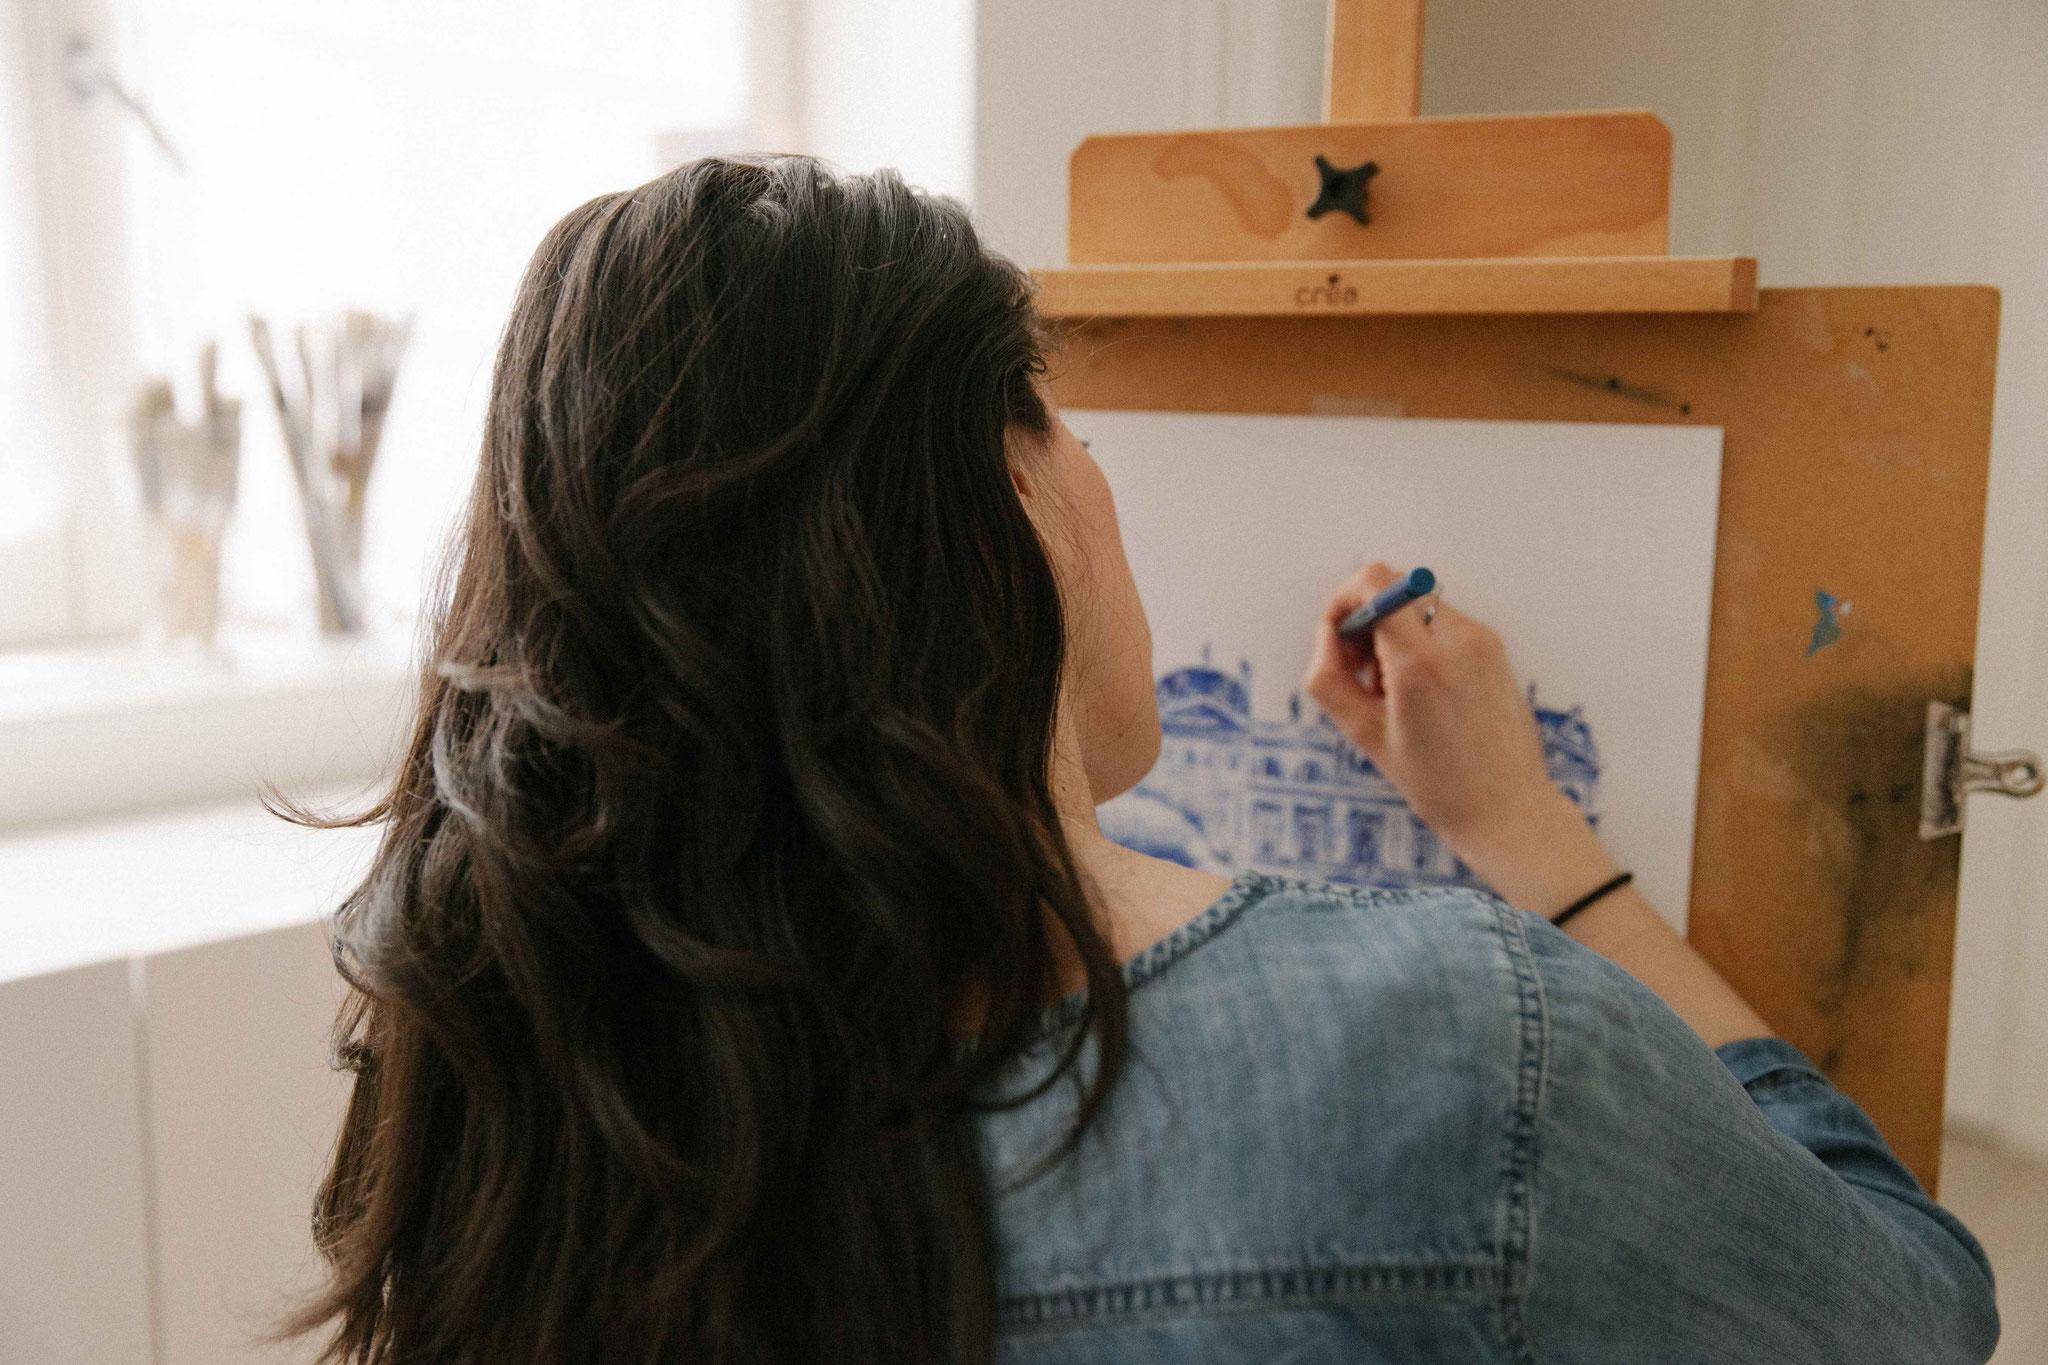 02. Dessin de ville - Audrey Apruzzese - Dessinatrice Lyonnaise Illustratrice